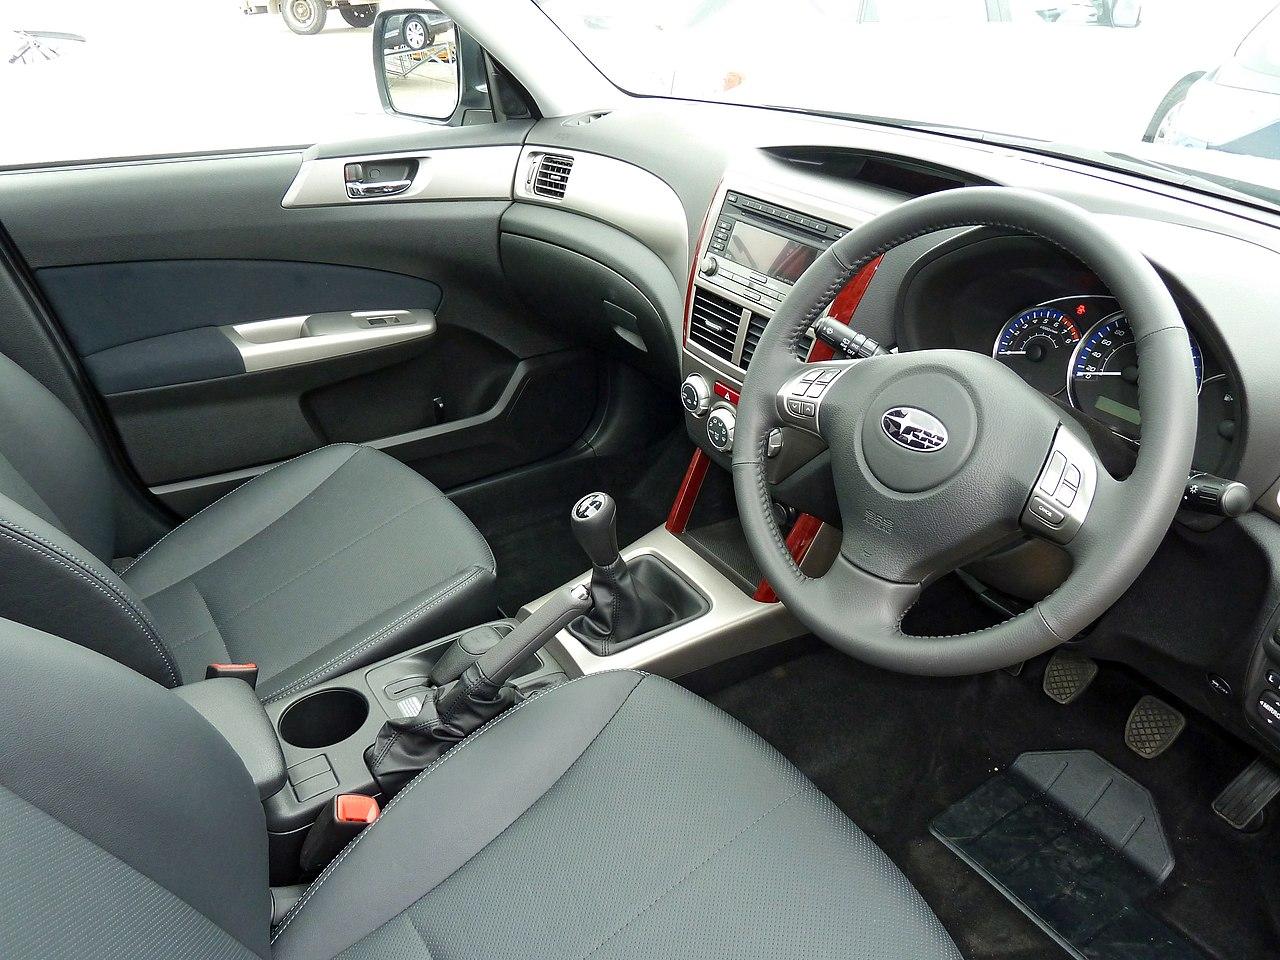 File:2010 Subaru Forester (SH9 MY10) XS Premium wagon (2010-10-19) 03.jpg